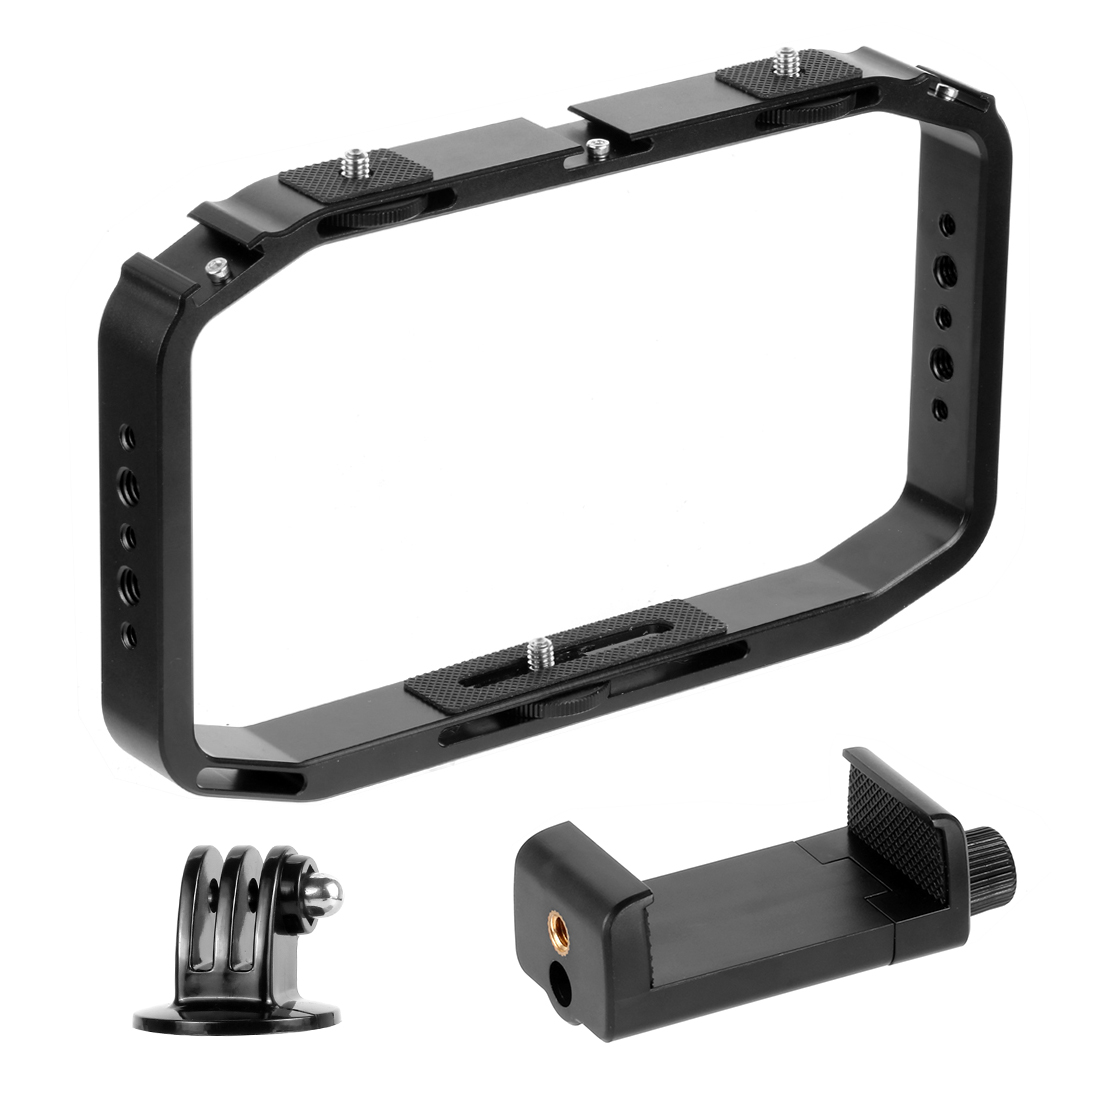 DSLR Video Rig Cage Handheld Smartphone Vlog Stabilizer Camera Cage For Gopro 7 6 For Xiaomi YI EKEN Sport Camera